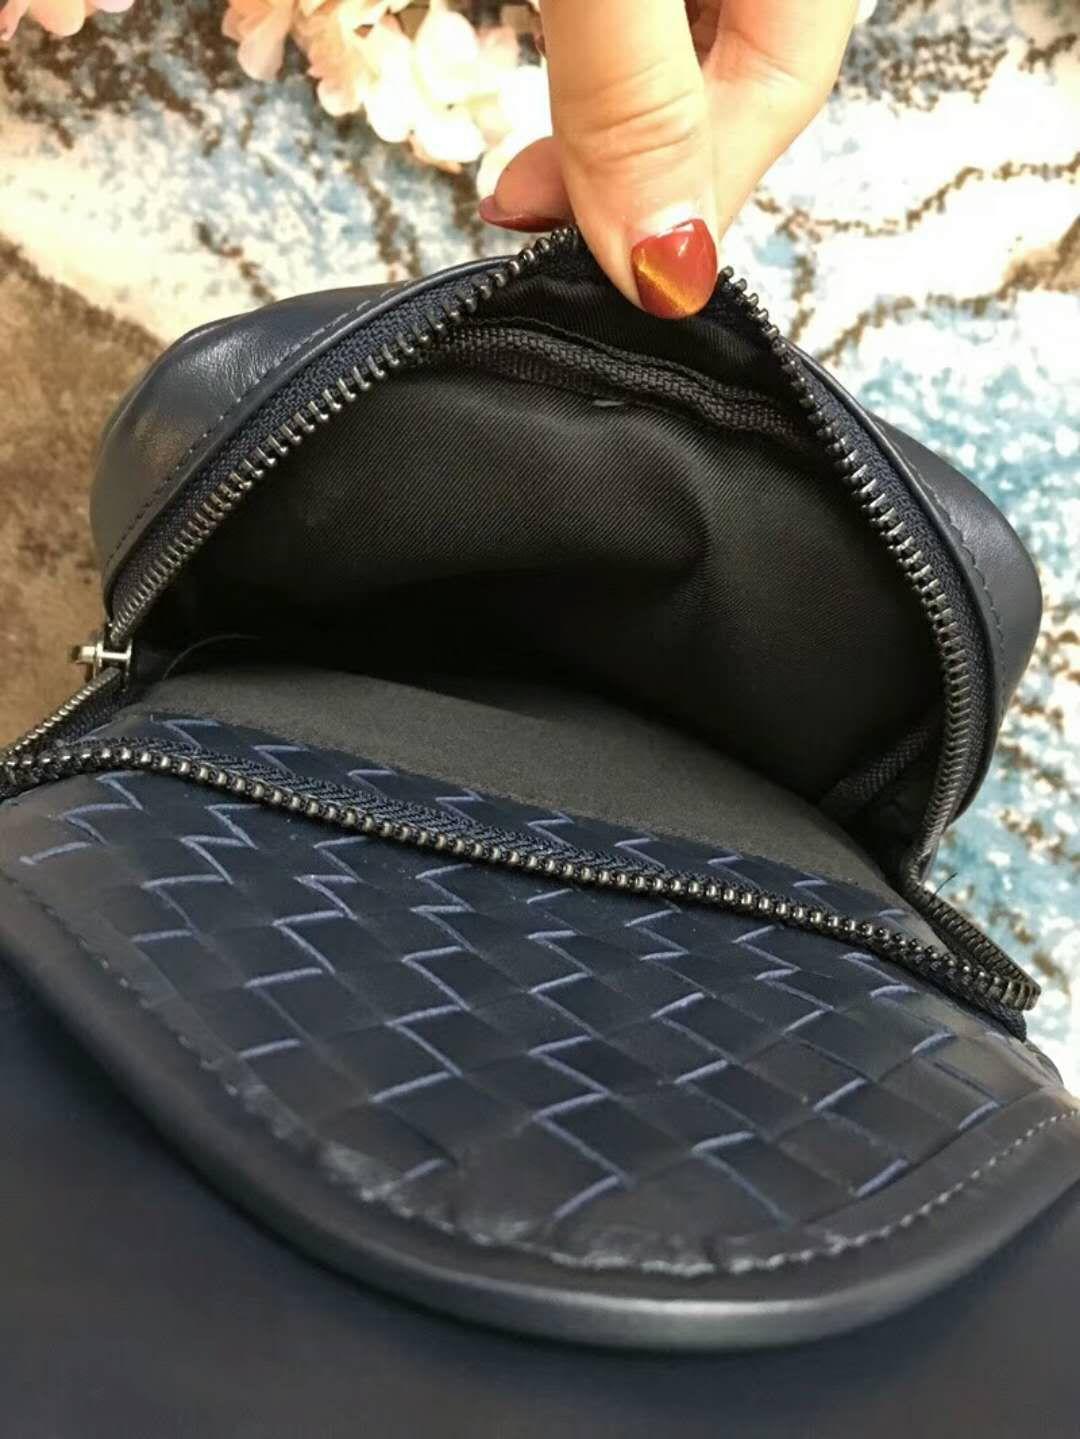 2018 boyfriend gift! men handmade material handbag classic business men office genuine cow leather bag braid casual kintting cross body 36cm